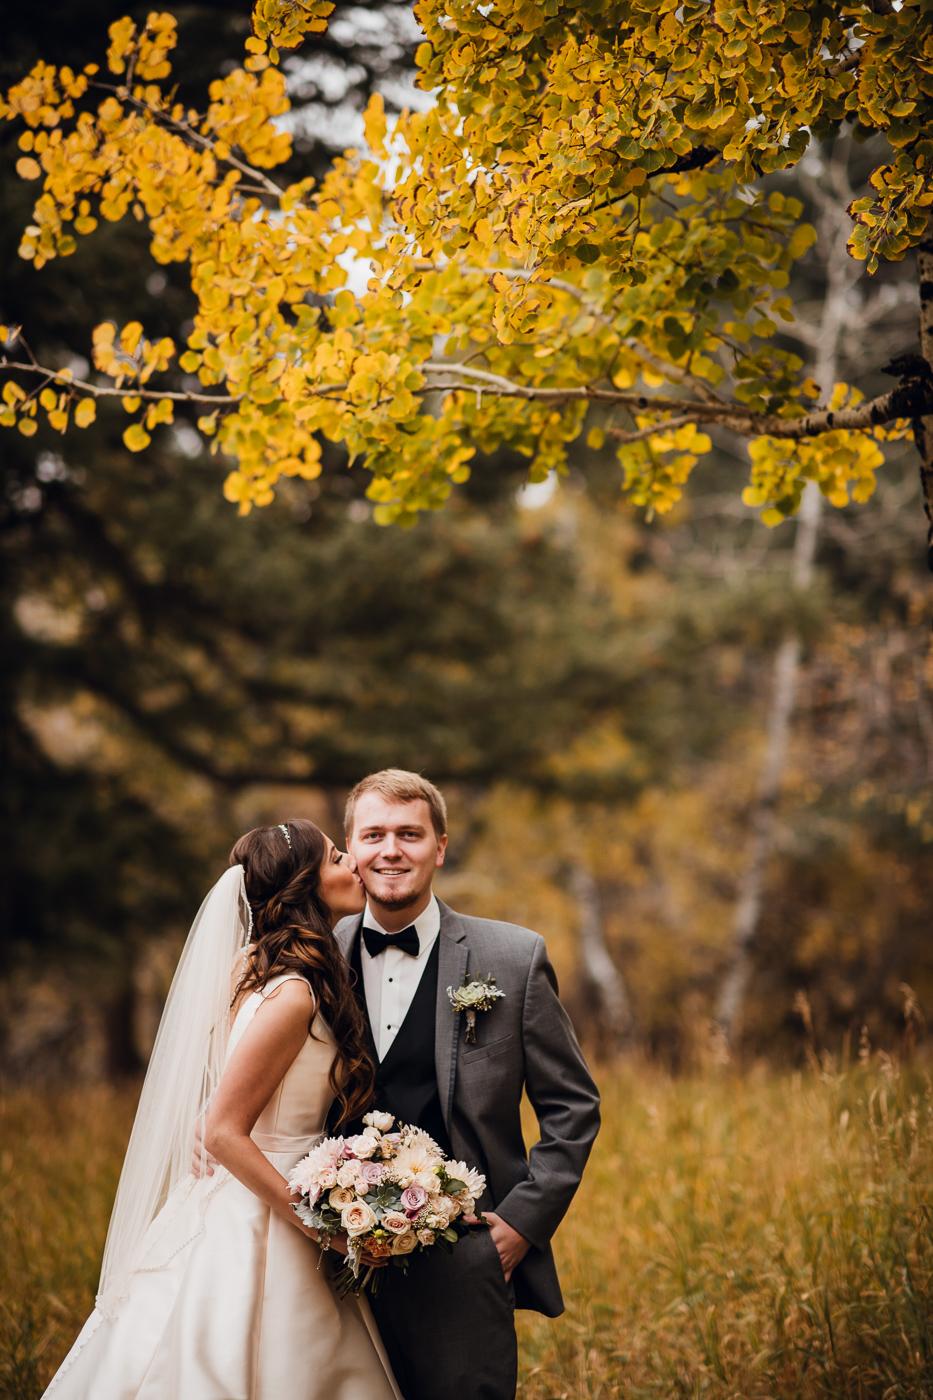 Candice Rawlin Wedding PHOCO Photography Pines Genesee Golden Colorado Fog -14.jpg